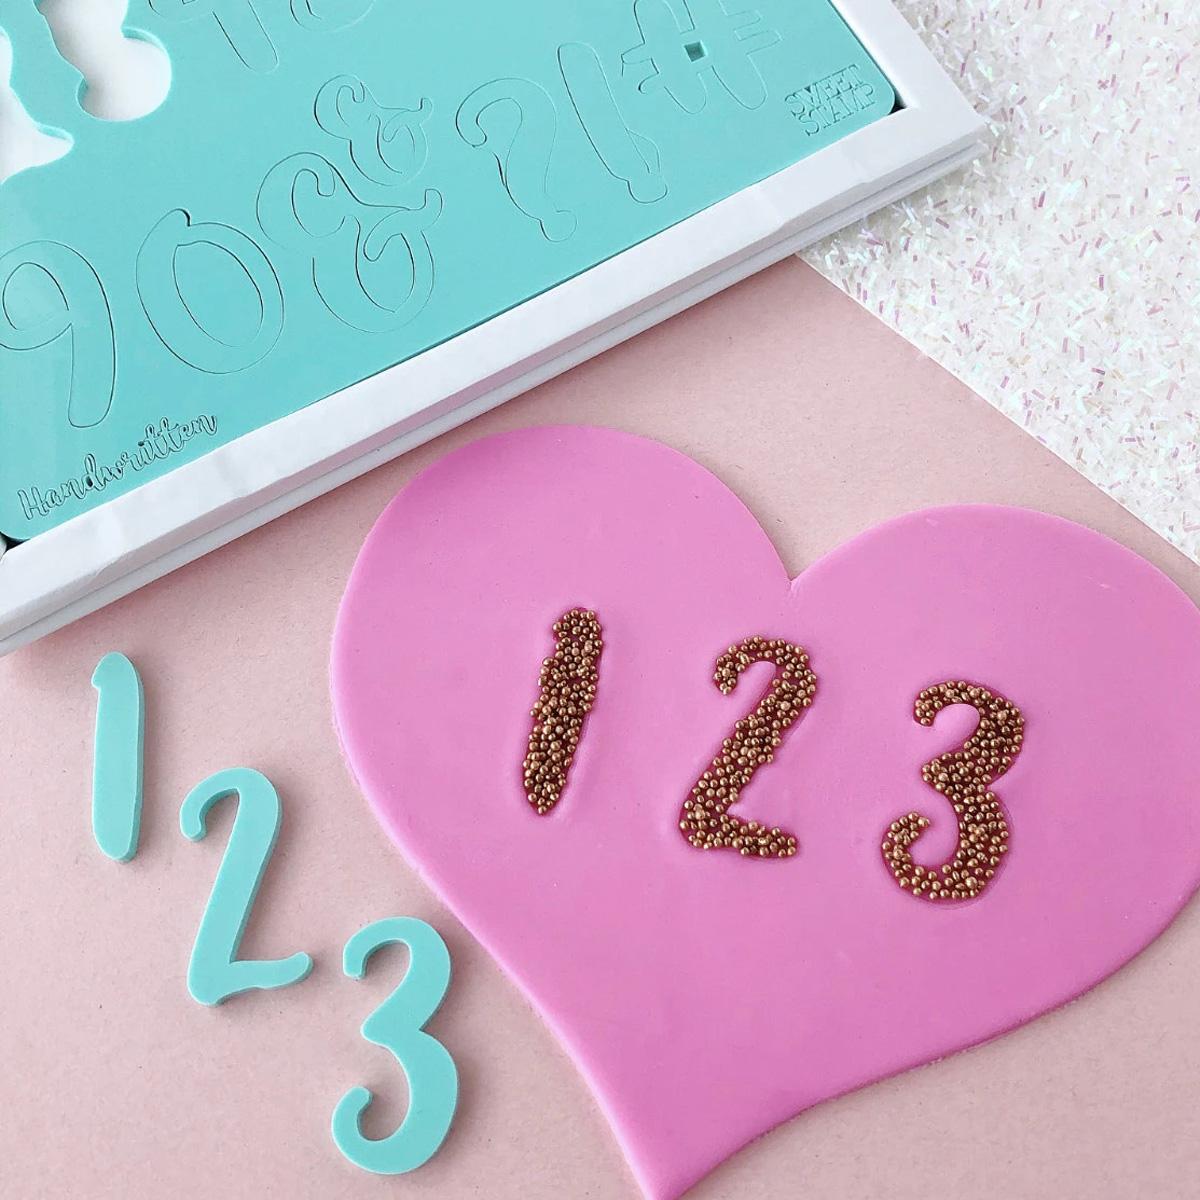 Sweet Stamp HANDWRITTEN Number Prägeset - Zahlen